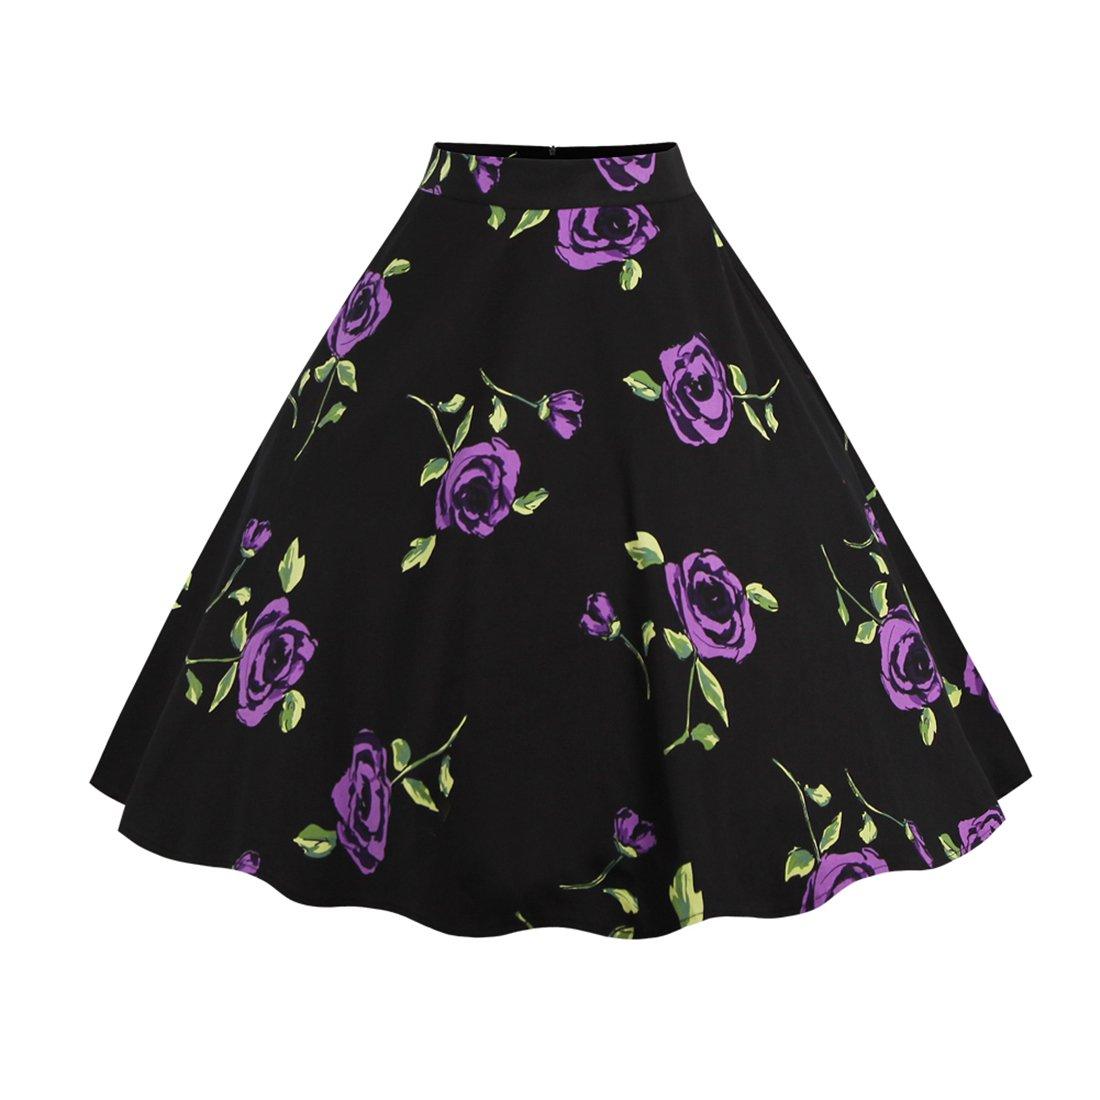 GWELL Damen Elegant 50er Jahre Retro Vintage Swing Röcke Faltenrock Knielang A-Linie Hohe Taille Rockabilly Tanzkleid Party Hochzeit